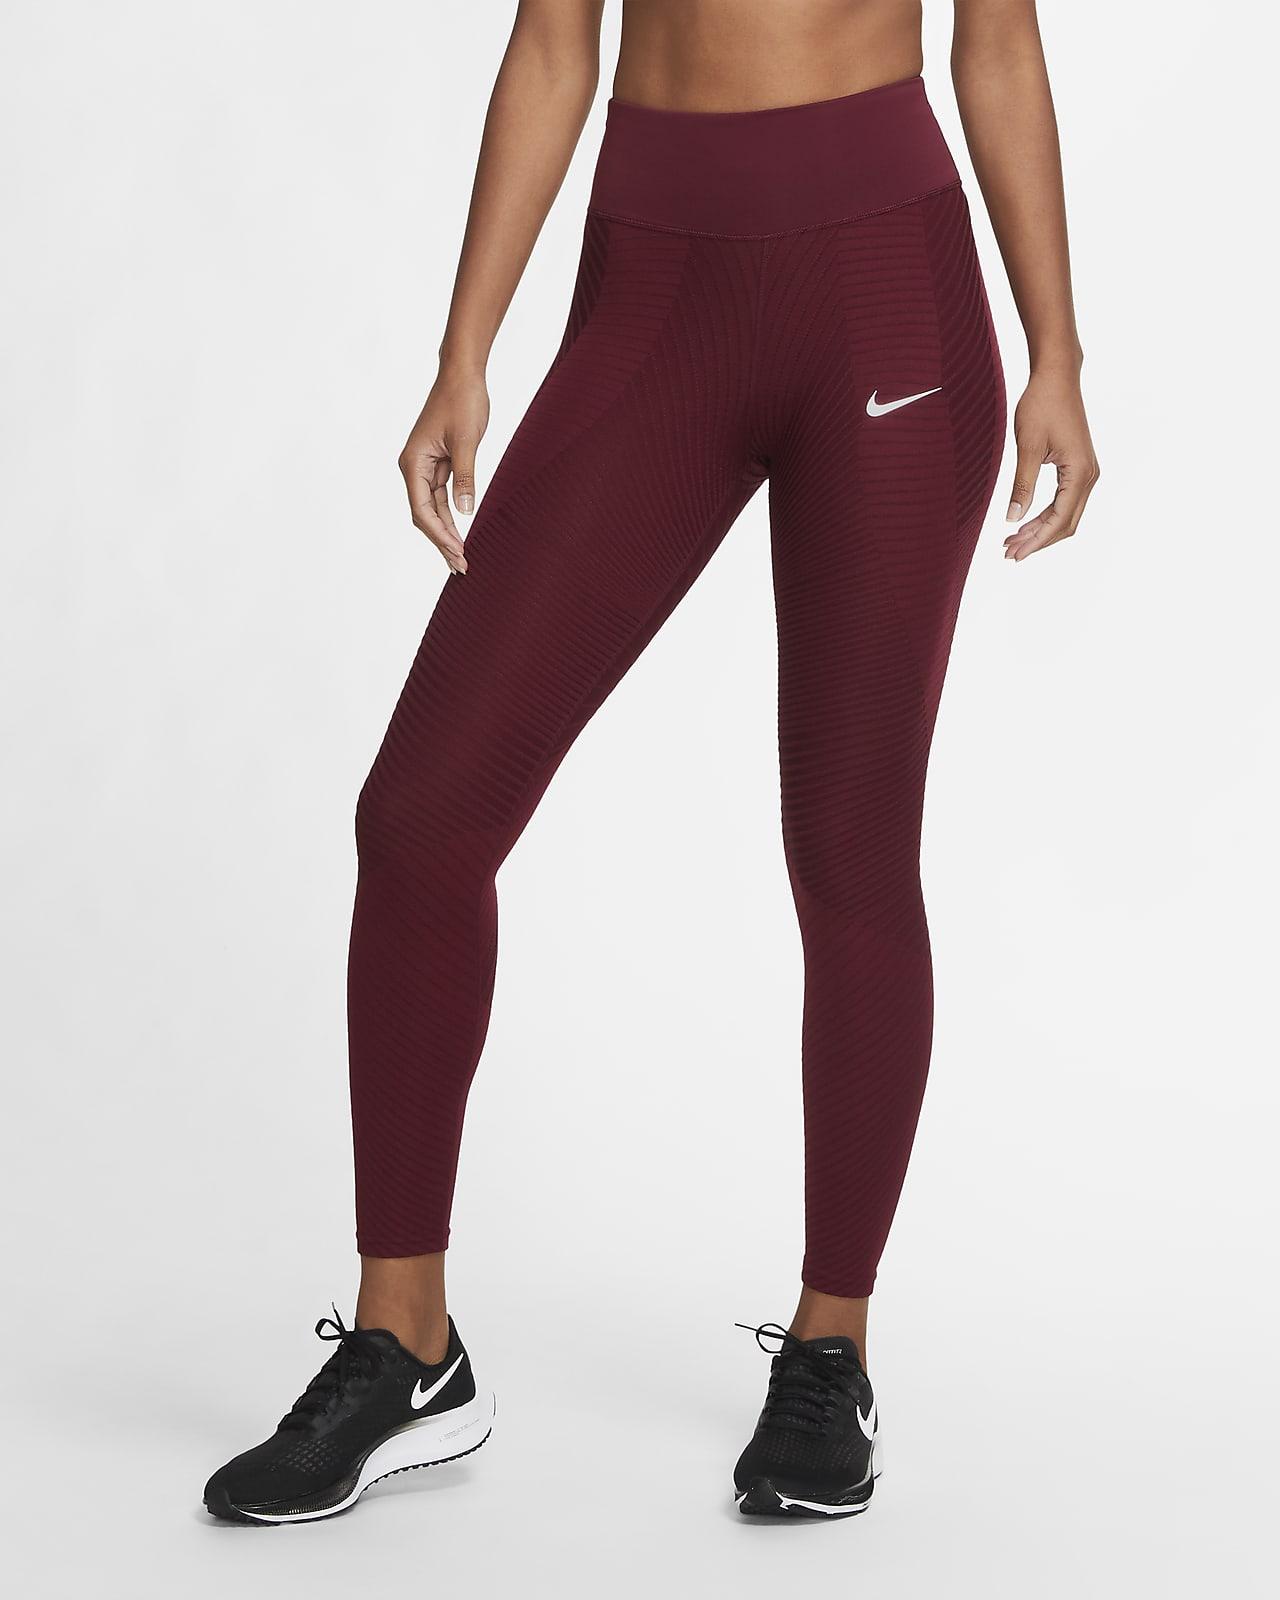 Nike Epic Luxe formet løpeleggings til dame